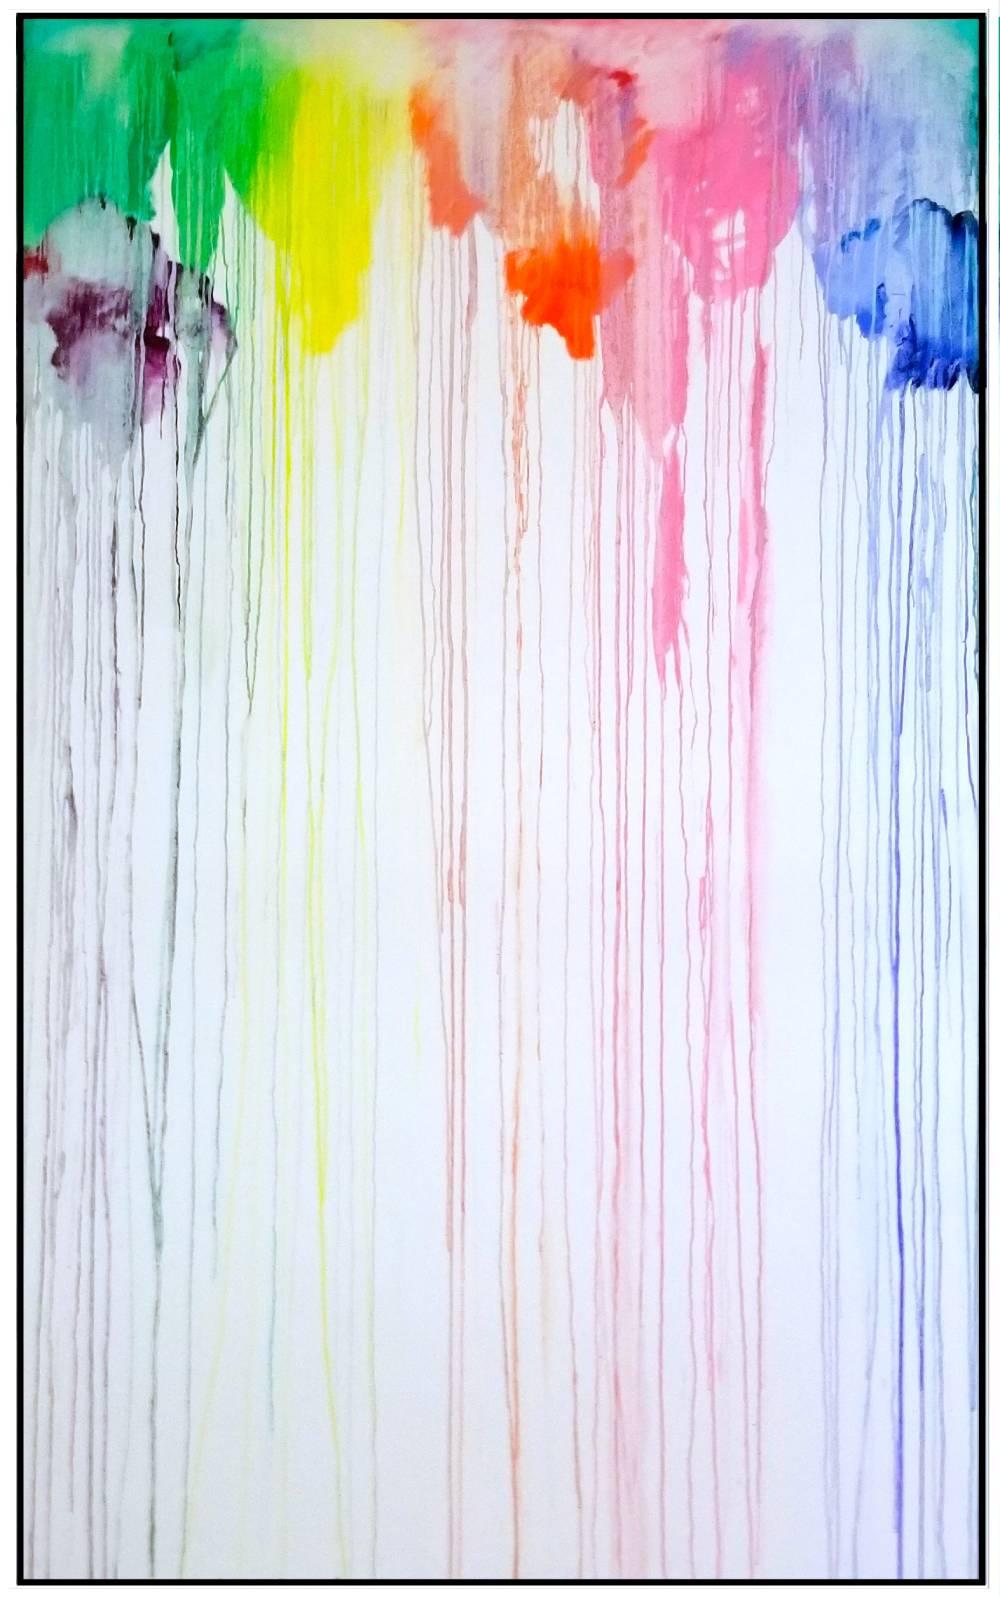 "Splash of Colour #14, 2019, acrylic on canvas, 60"" x 96"" (152.4 x 244 cm)"